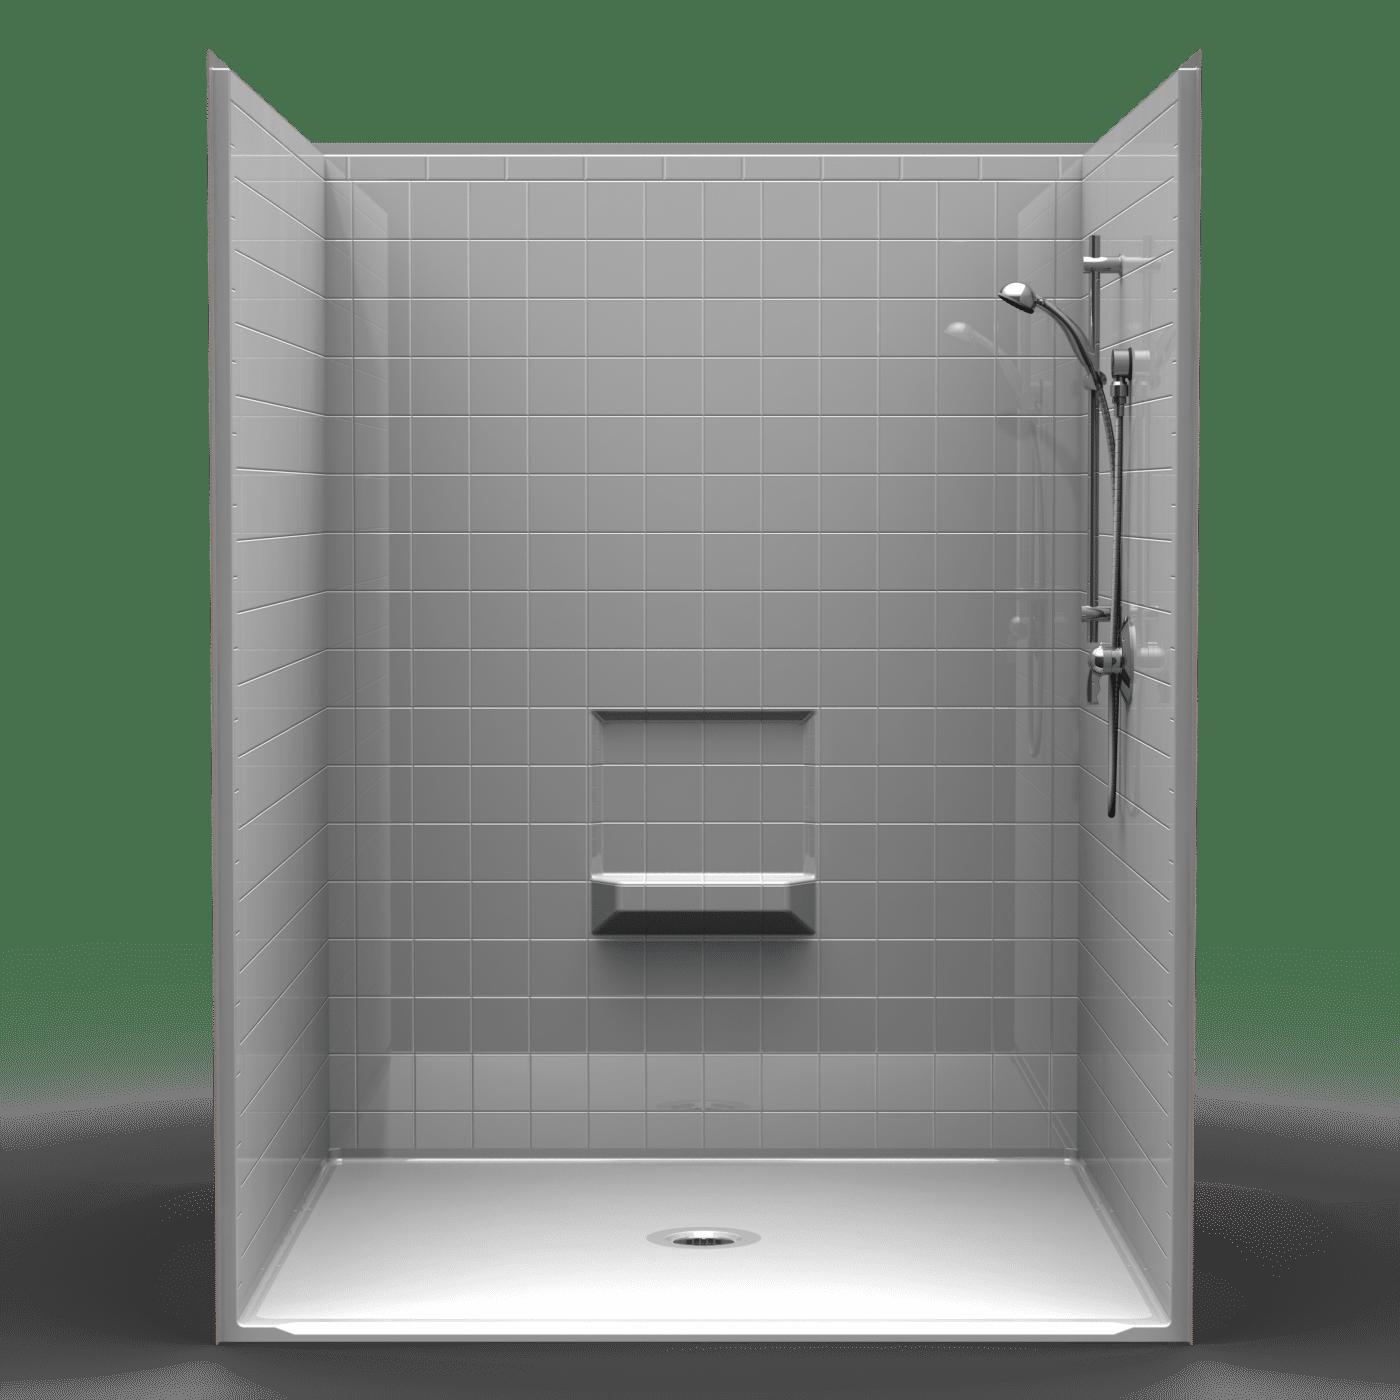 Best Bath Shower Pans 4lrs6060b1b Four Piece 60 X 60 Roll In Shower 1